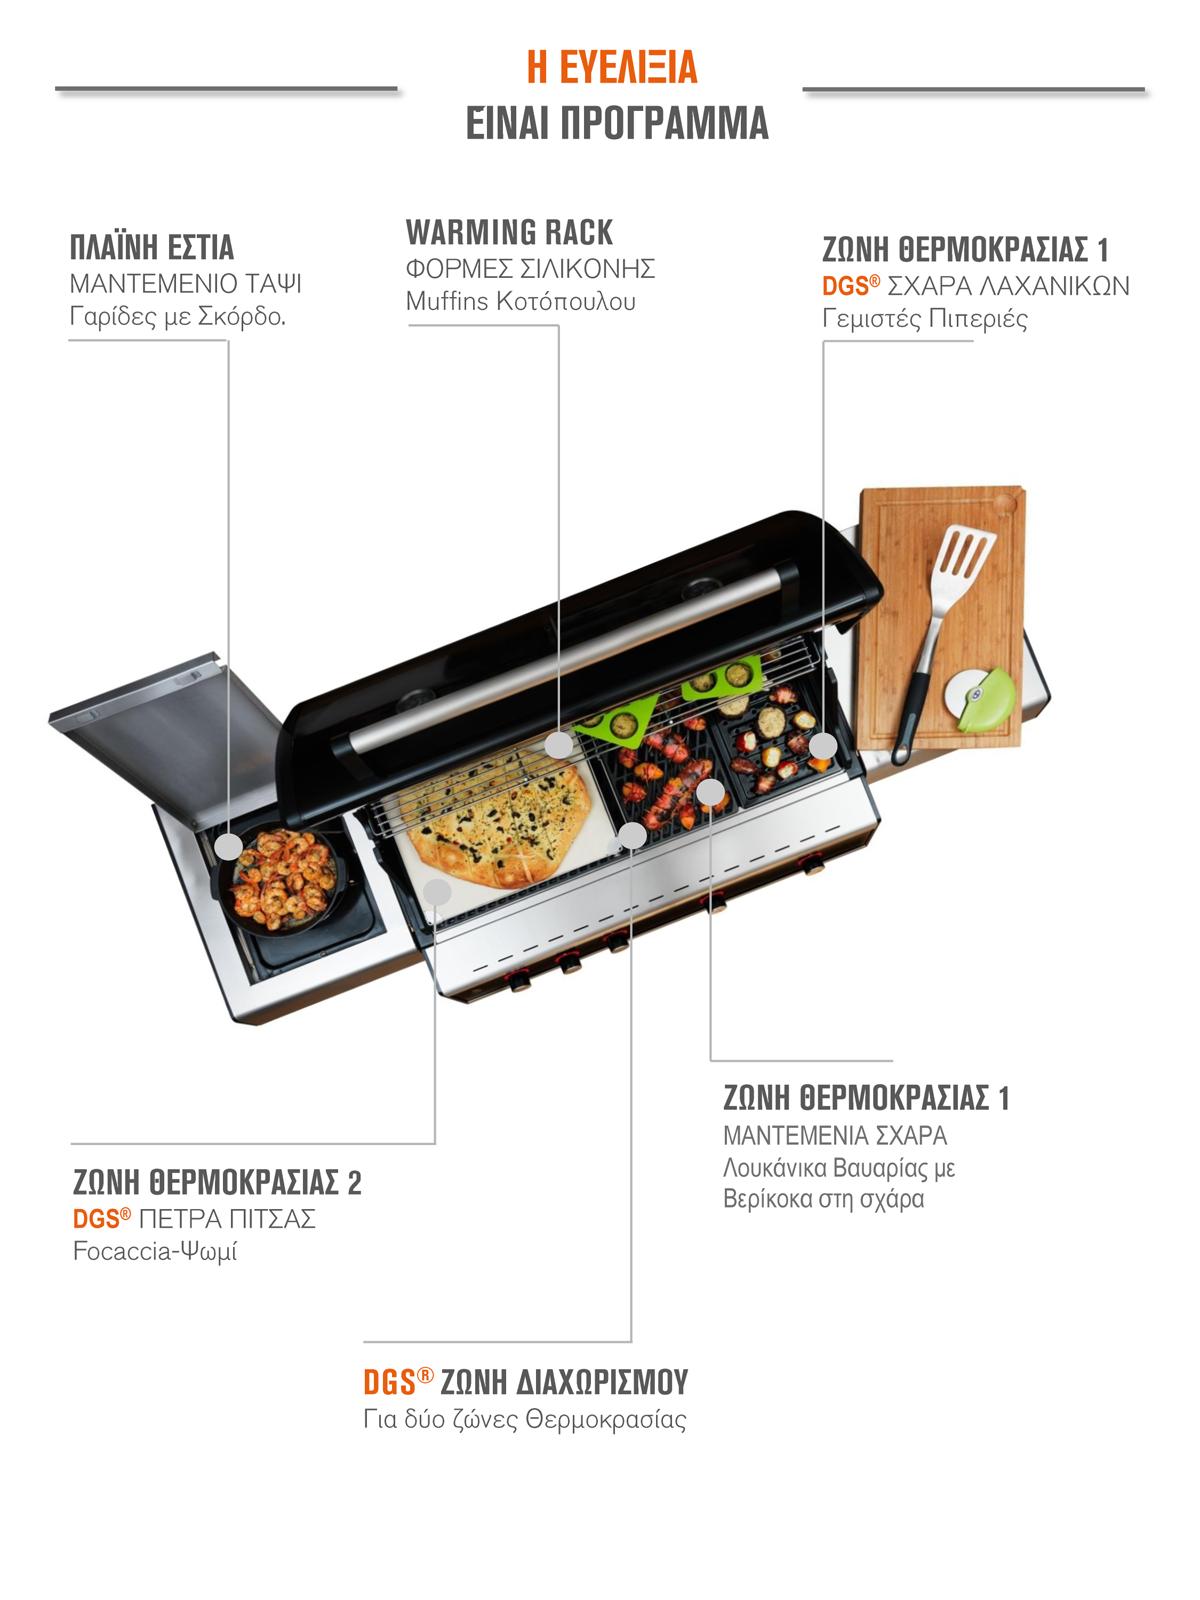 To Dual Gourmet System εγγυάται ομοιόμορφη κατανομή της θερμότητας σε όλο το θάλαμο της ψησταριάς.